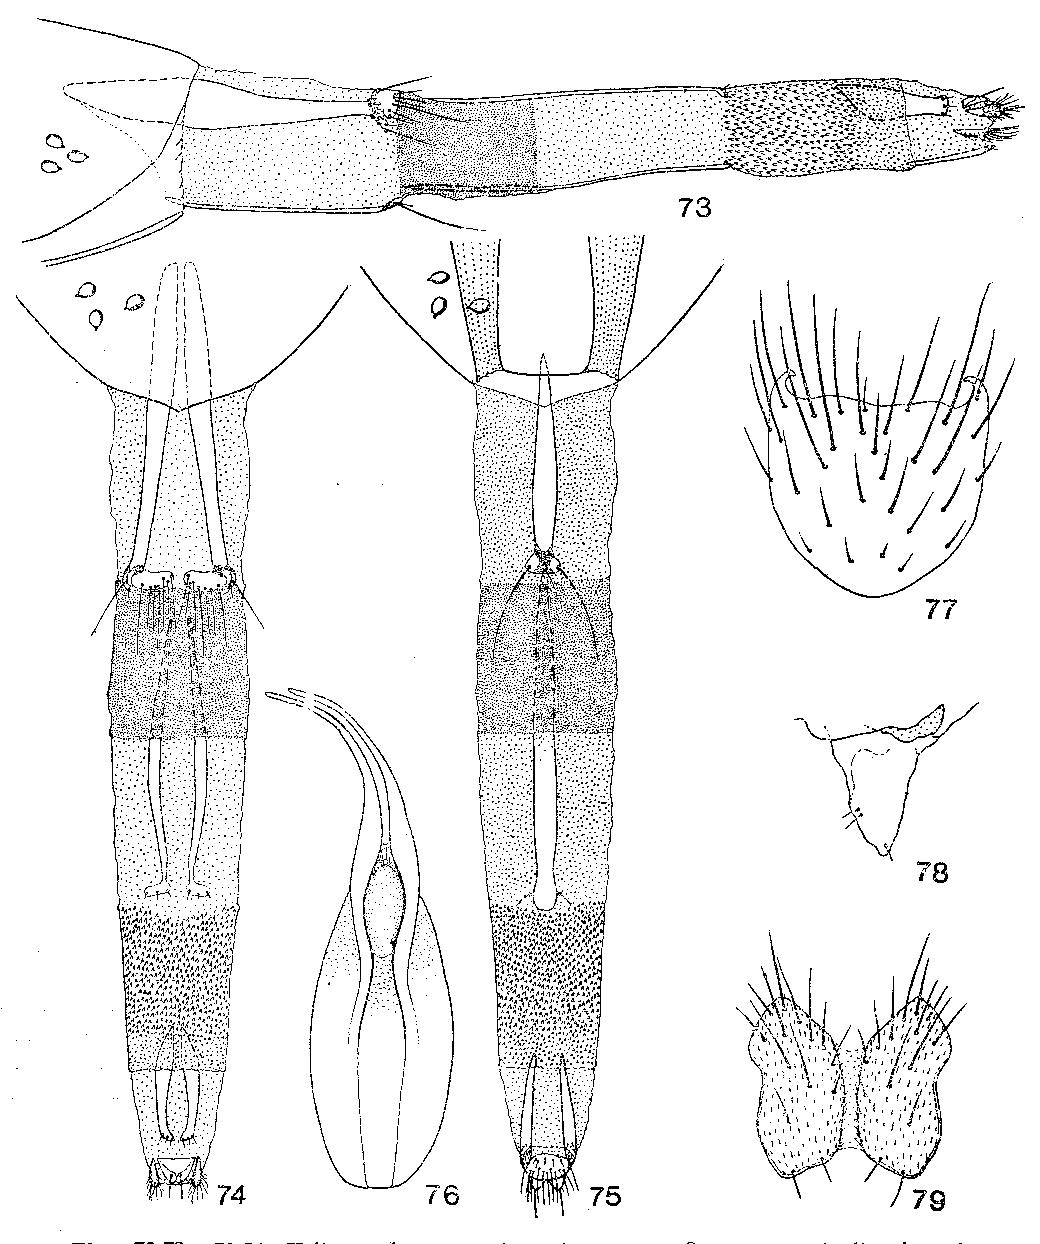 figure 73-79